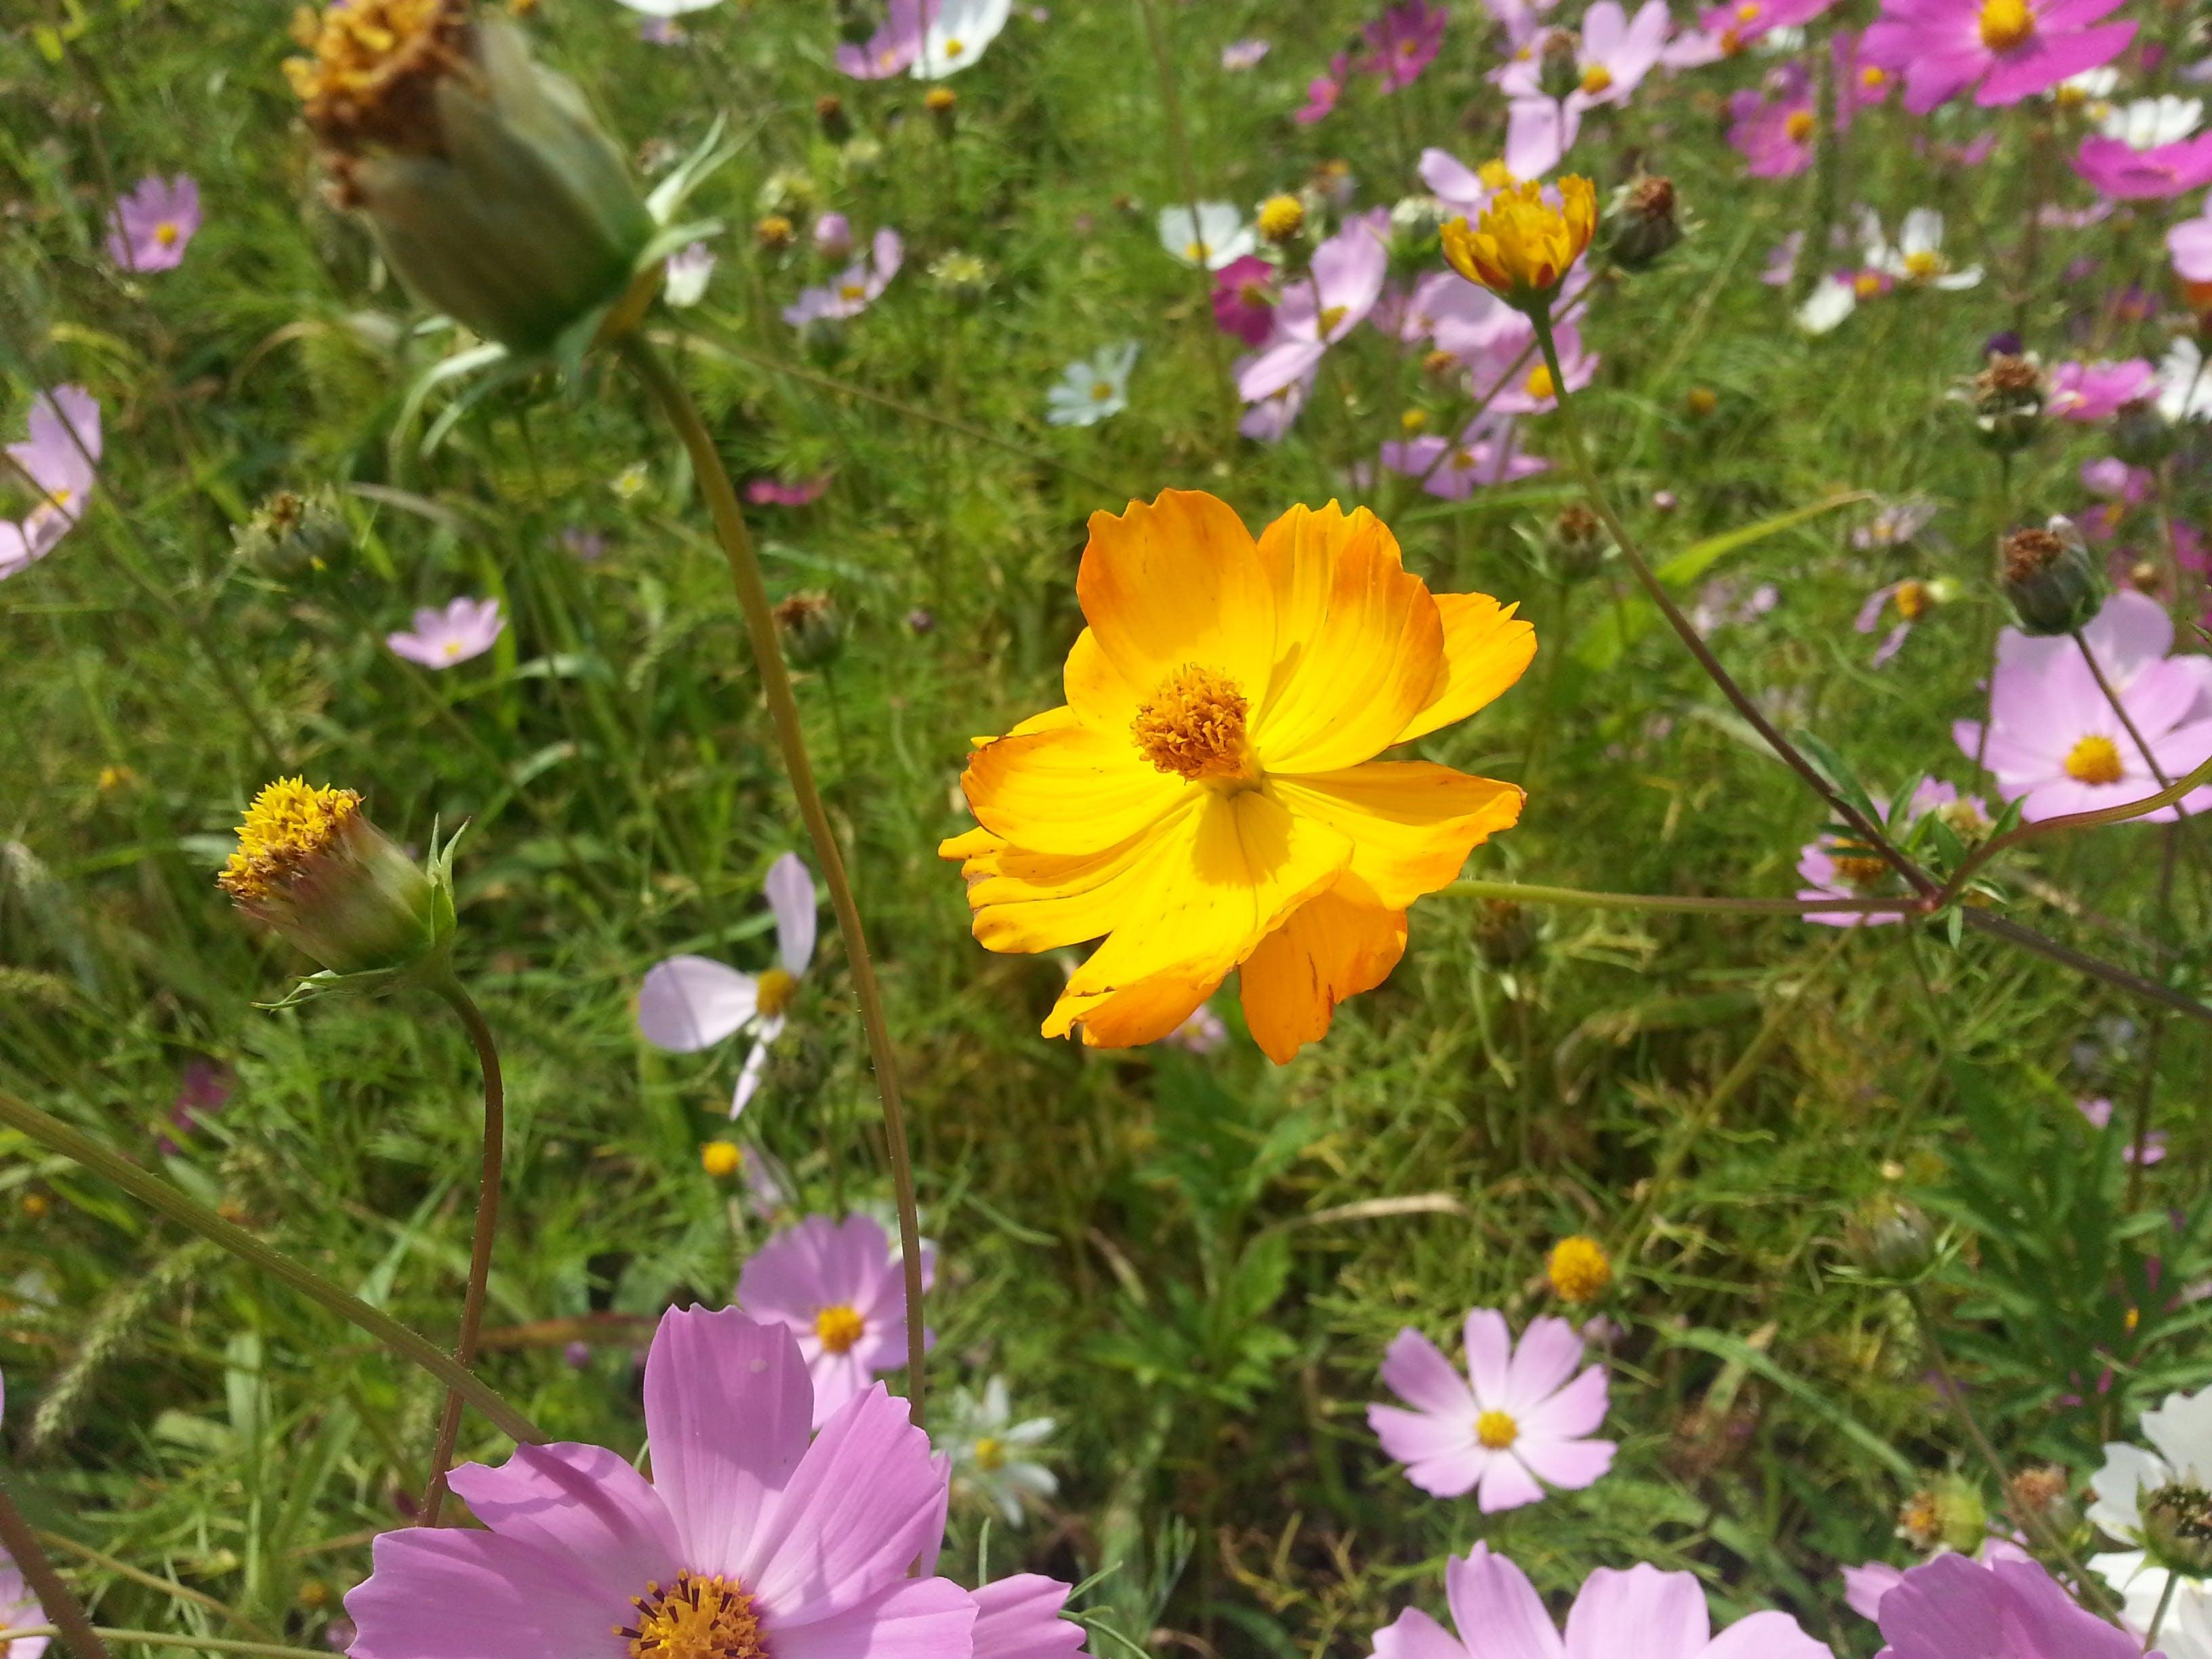 Free stock photo of flowers, summer, purple, yellow